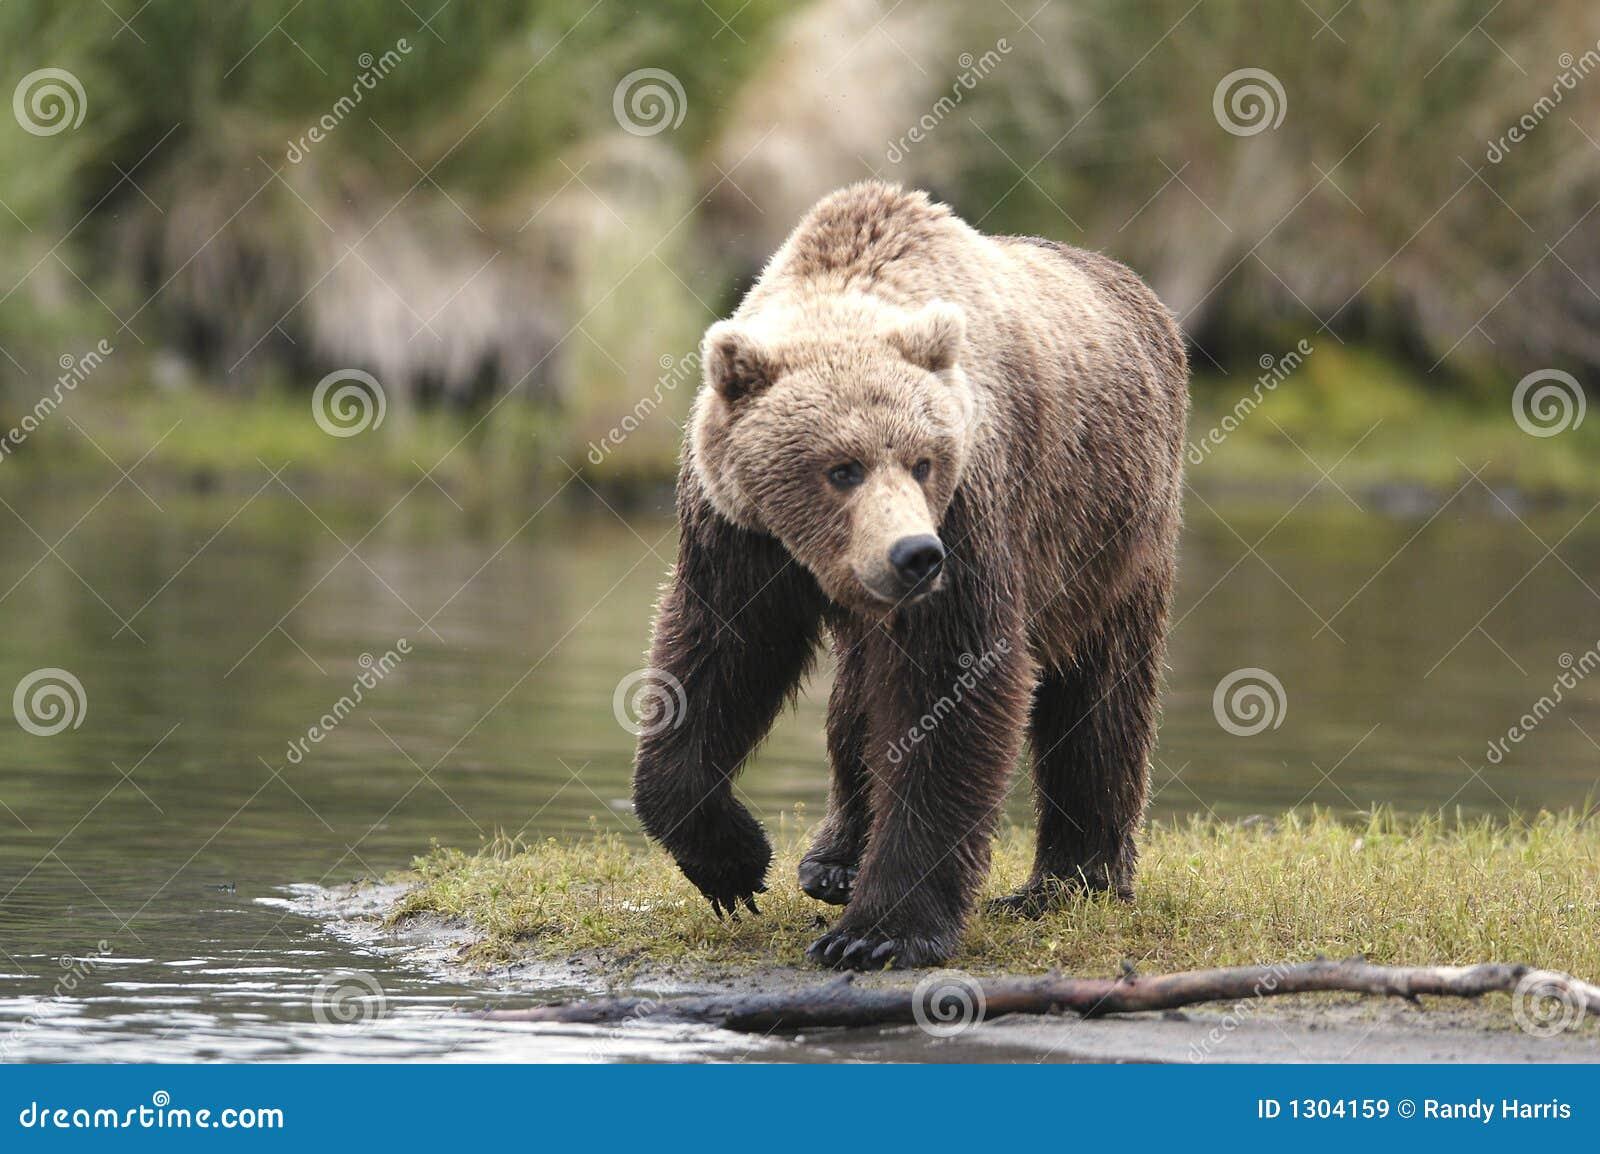 Enrichment & Animal Welfare | Wild Welfare  |Brown Bear Food